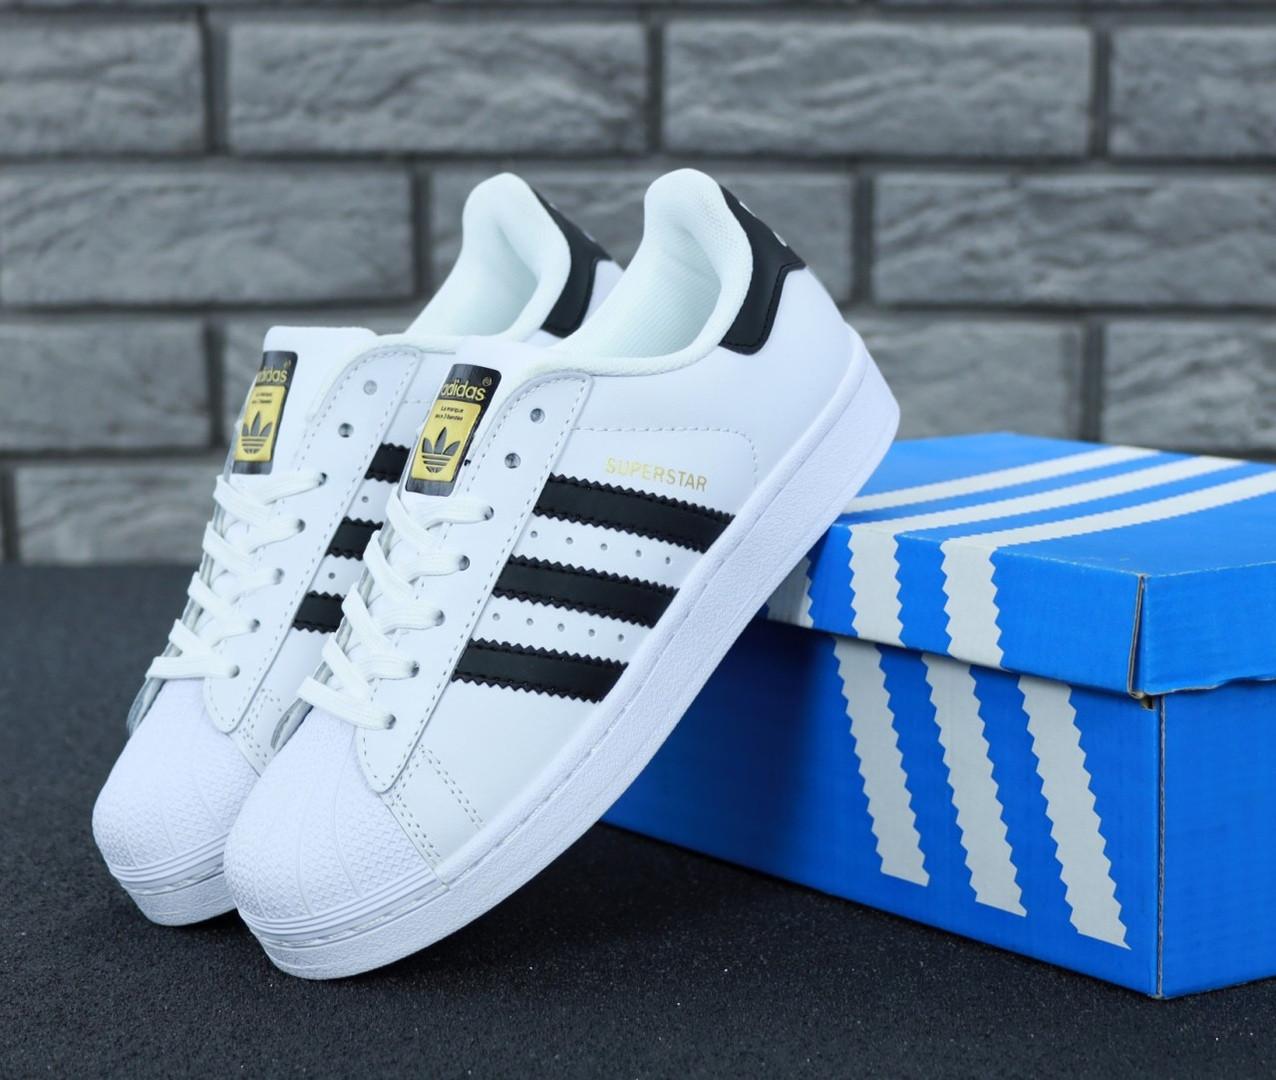 bd96d78f Кроссовки мужские Adidas Superstar White/Black/Gold, адидас суперстар /  Реплика 1: